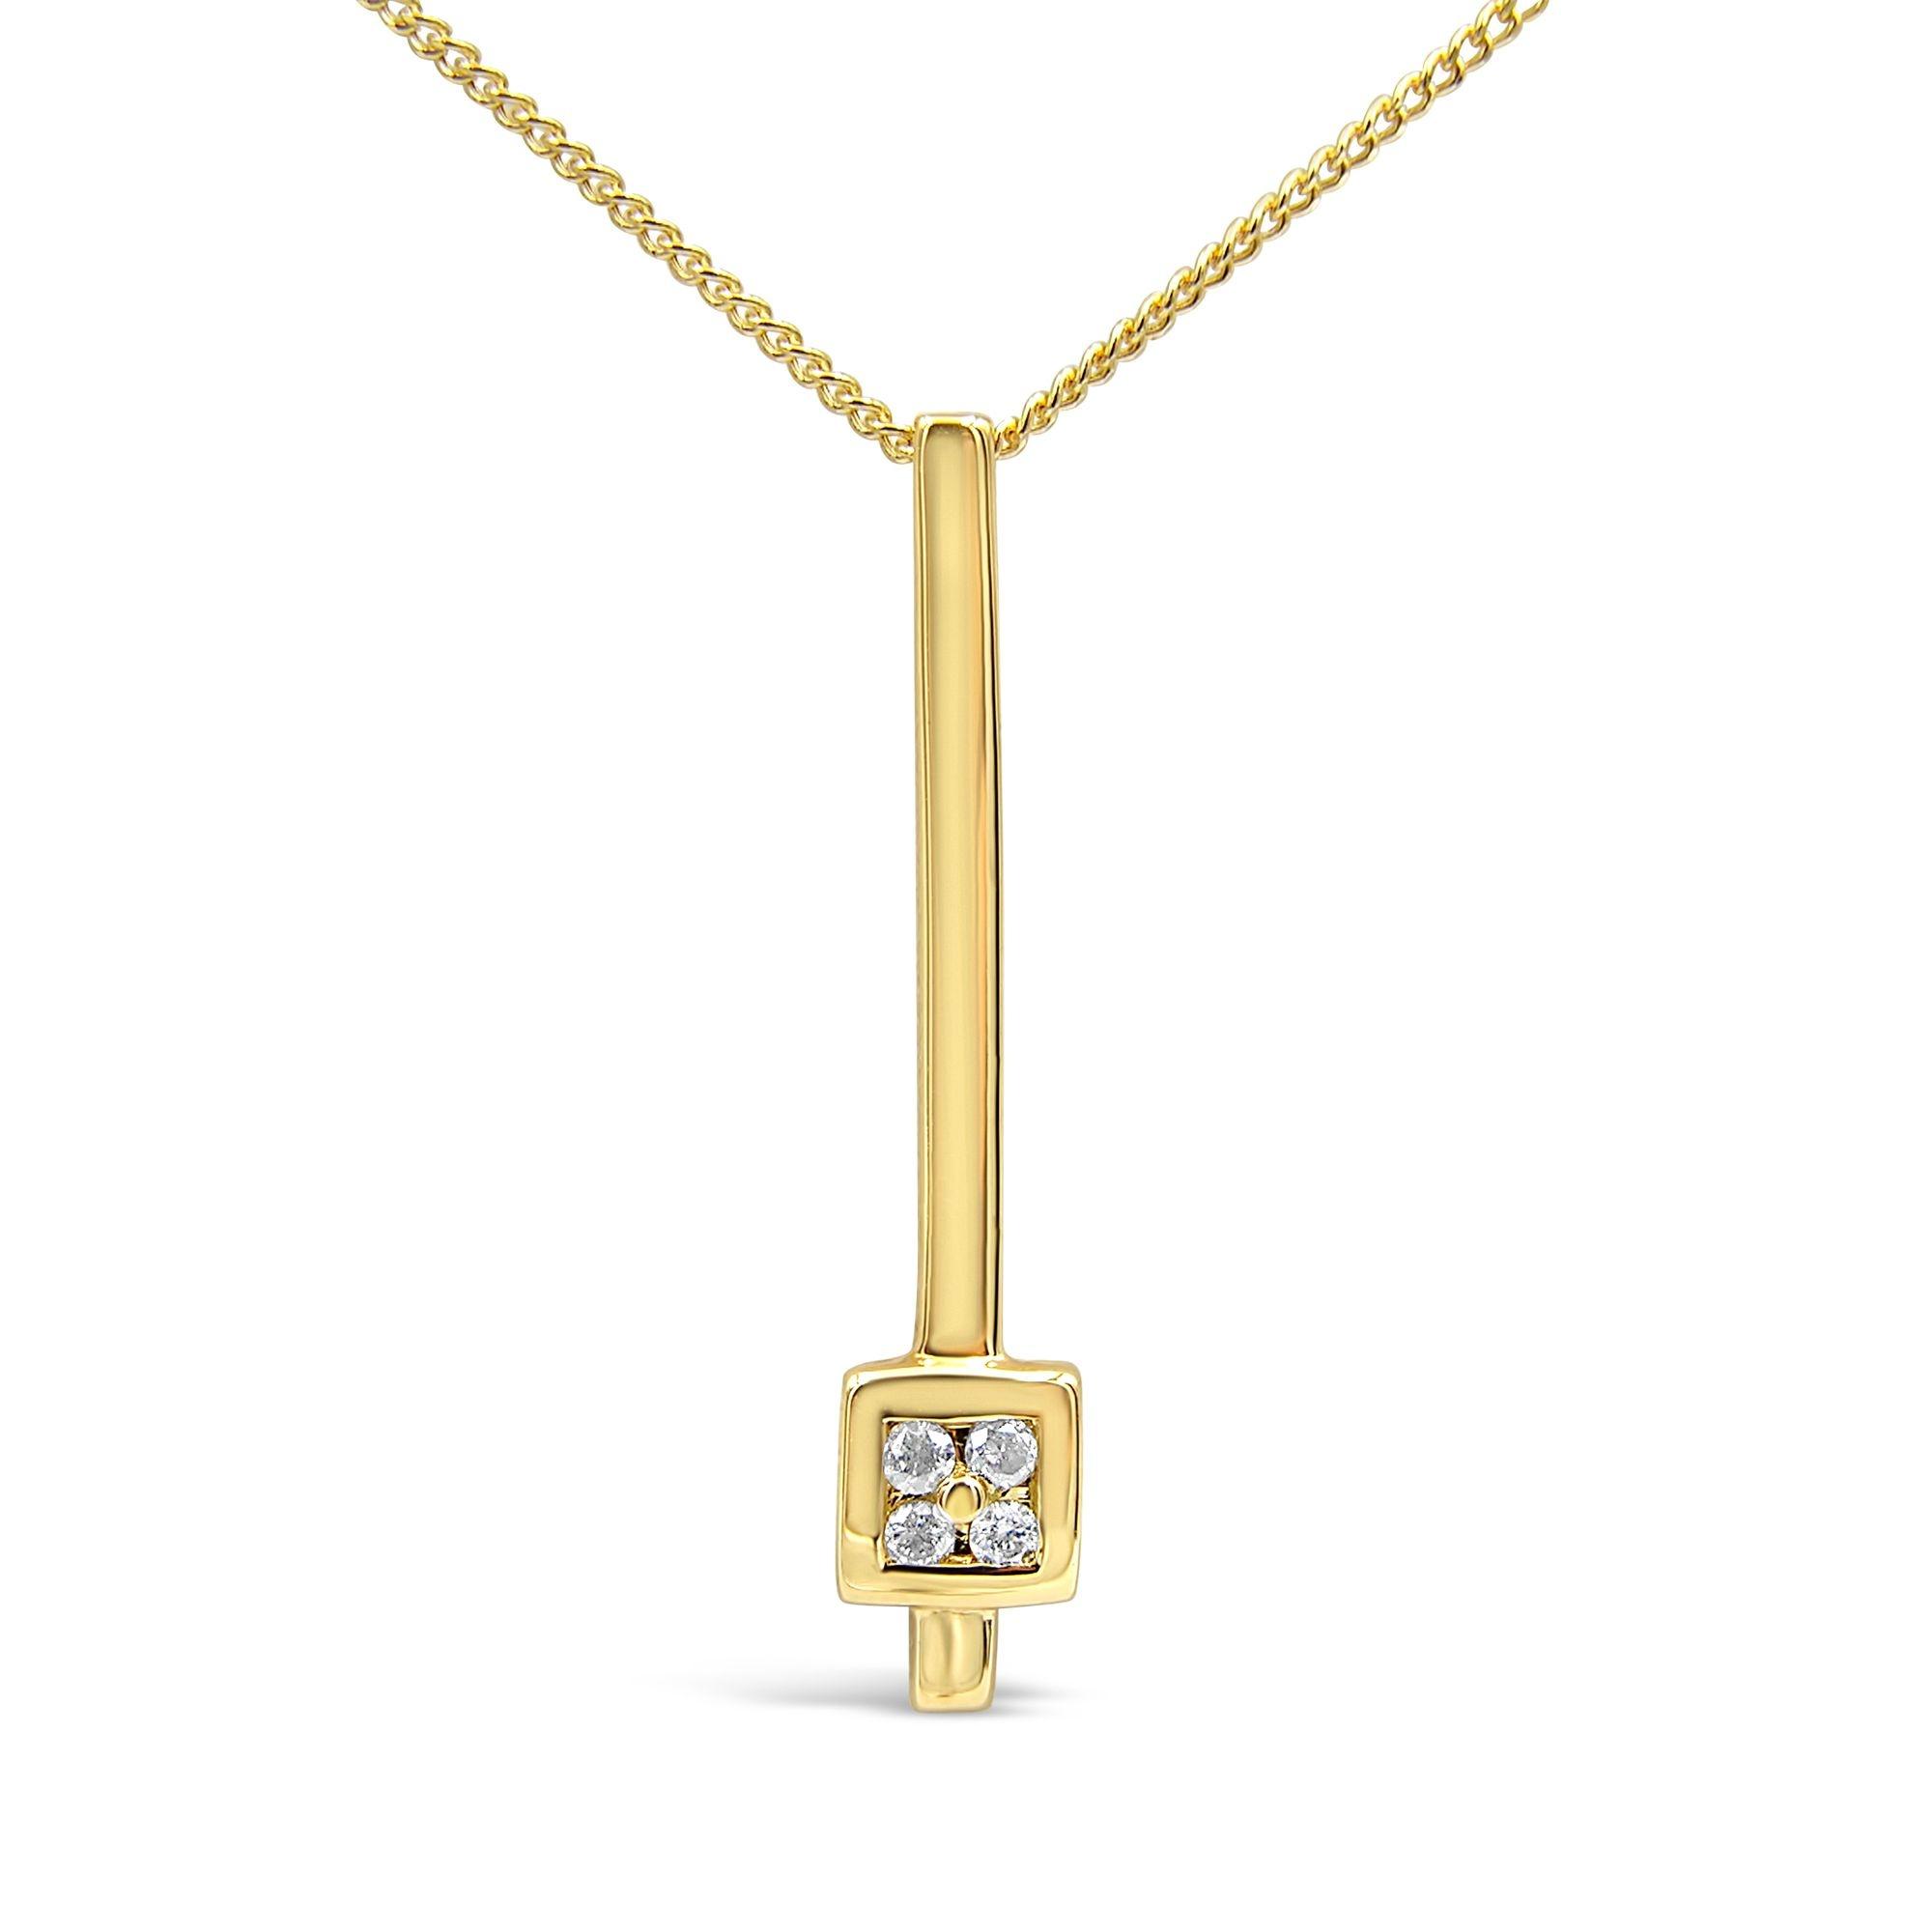 18 karat yellow gold pendant with 0.08 ct diamonds